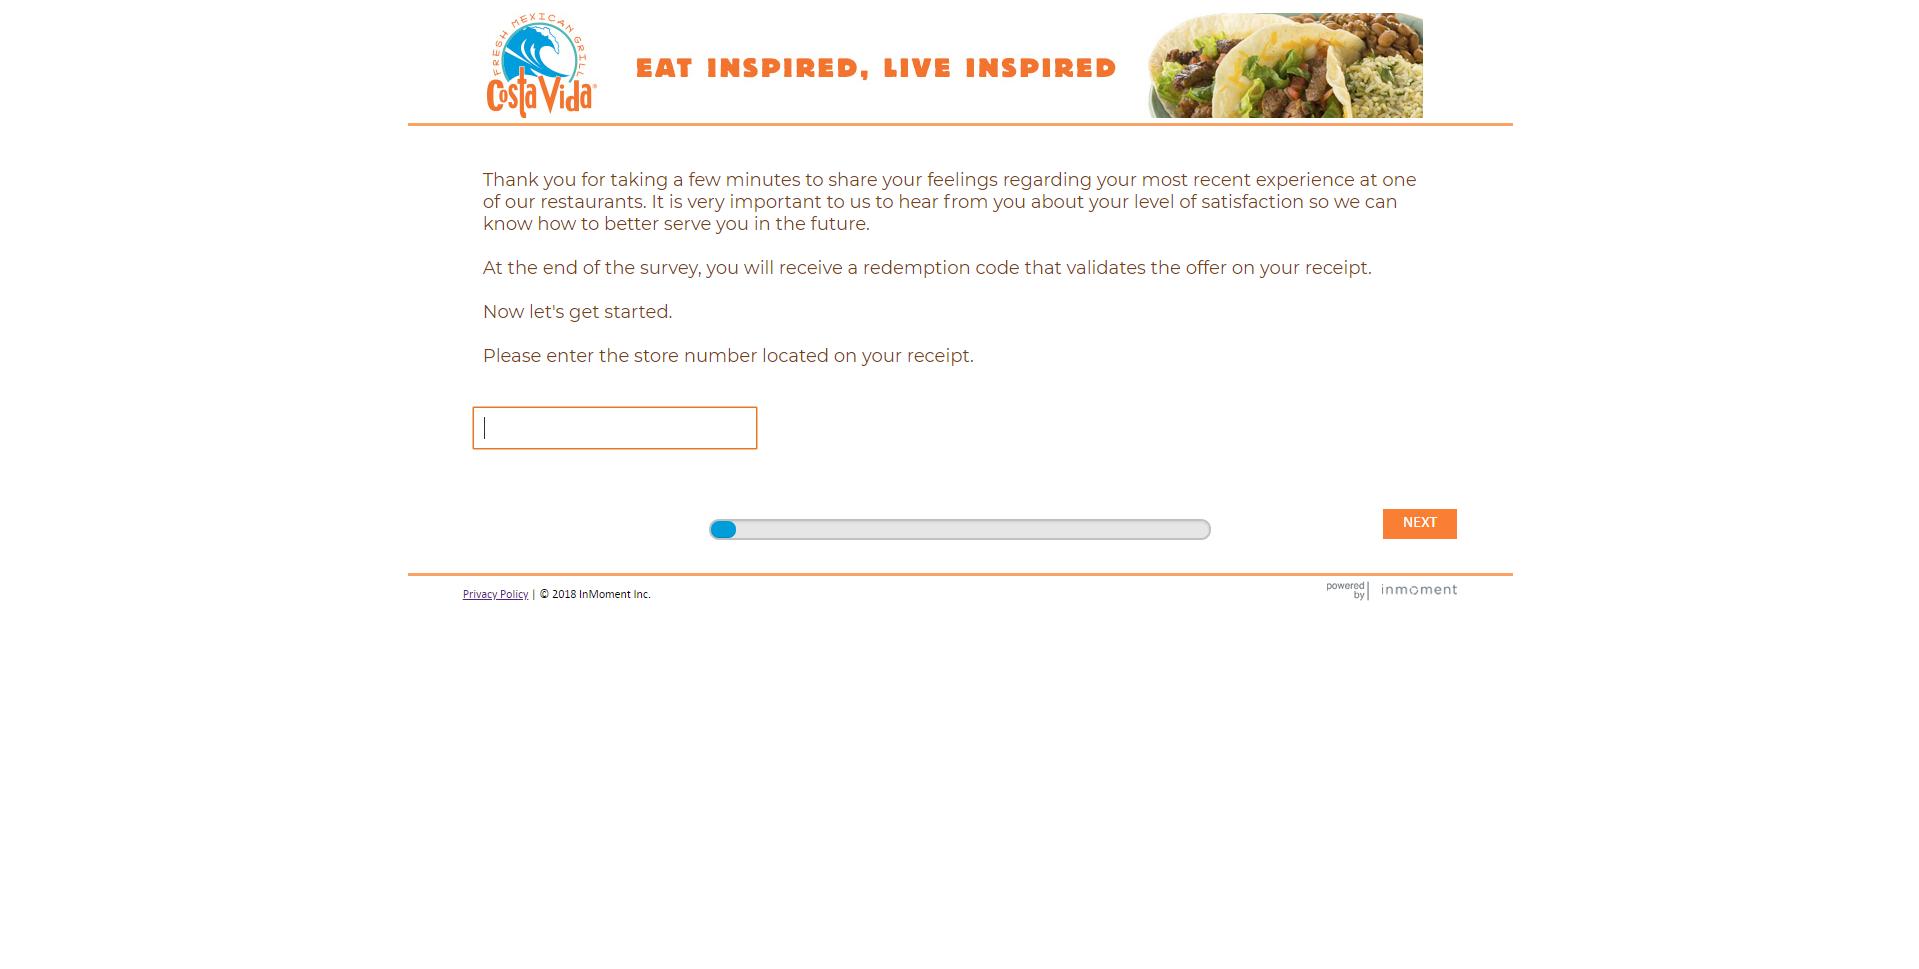 www.costavida.net/survey